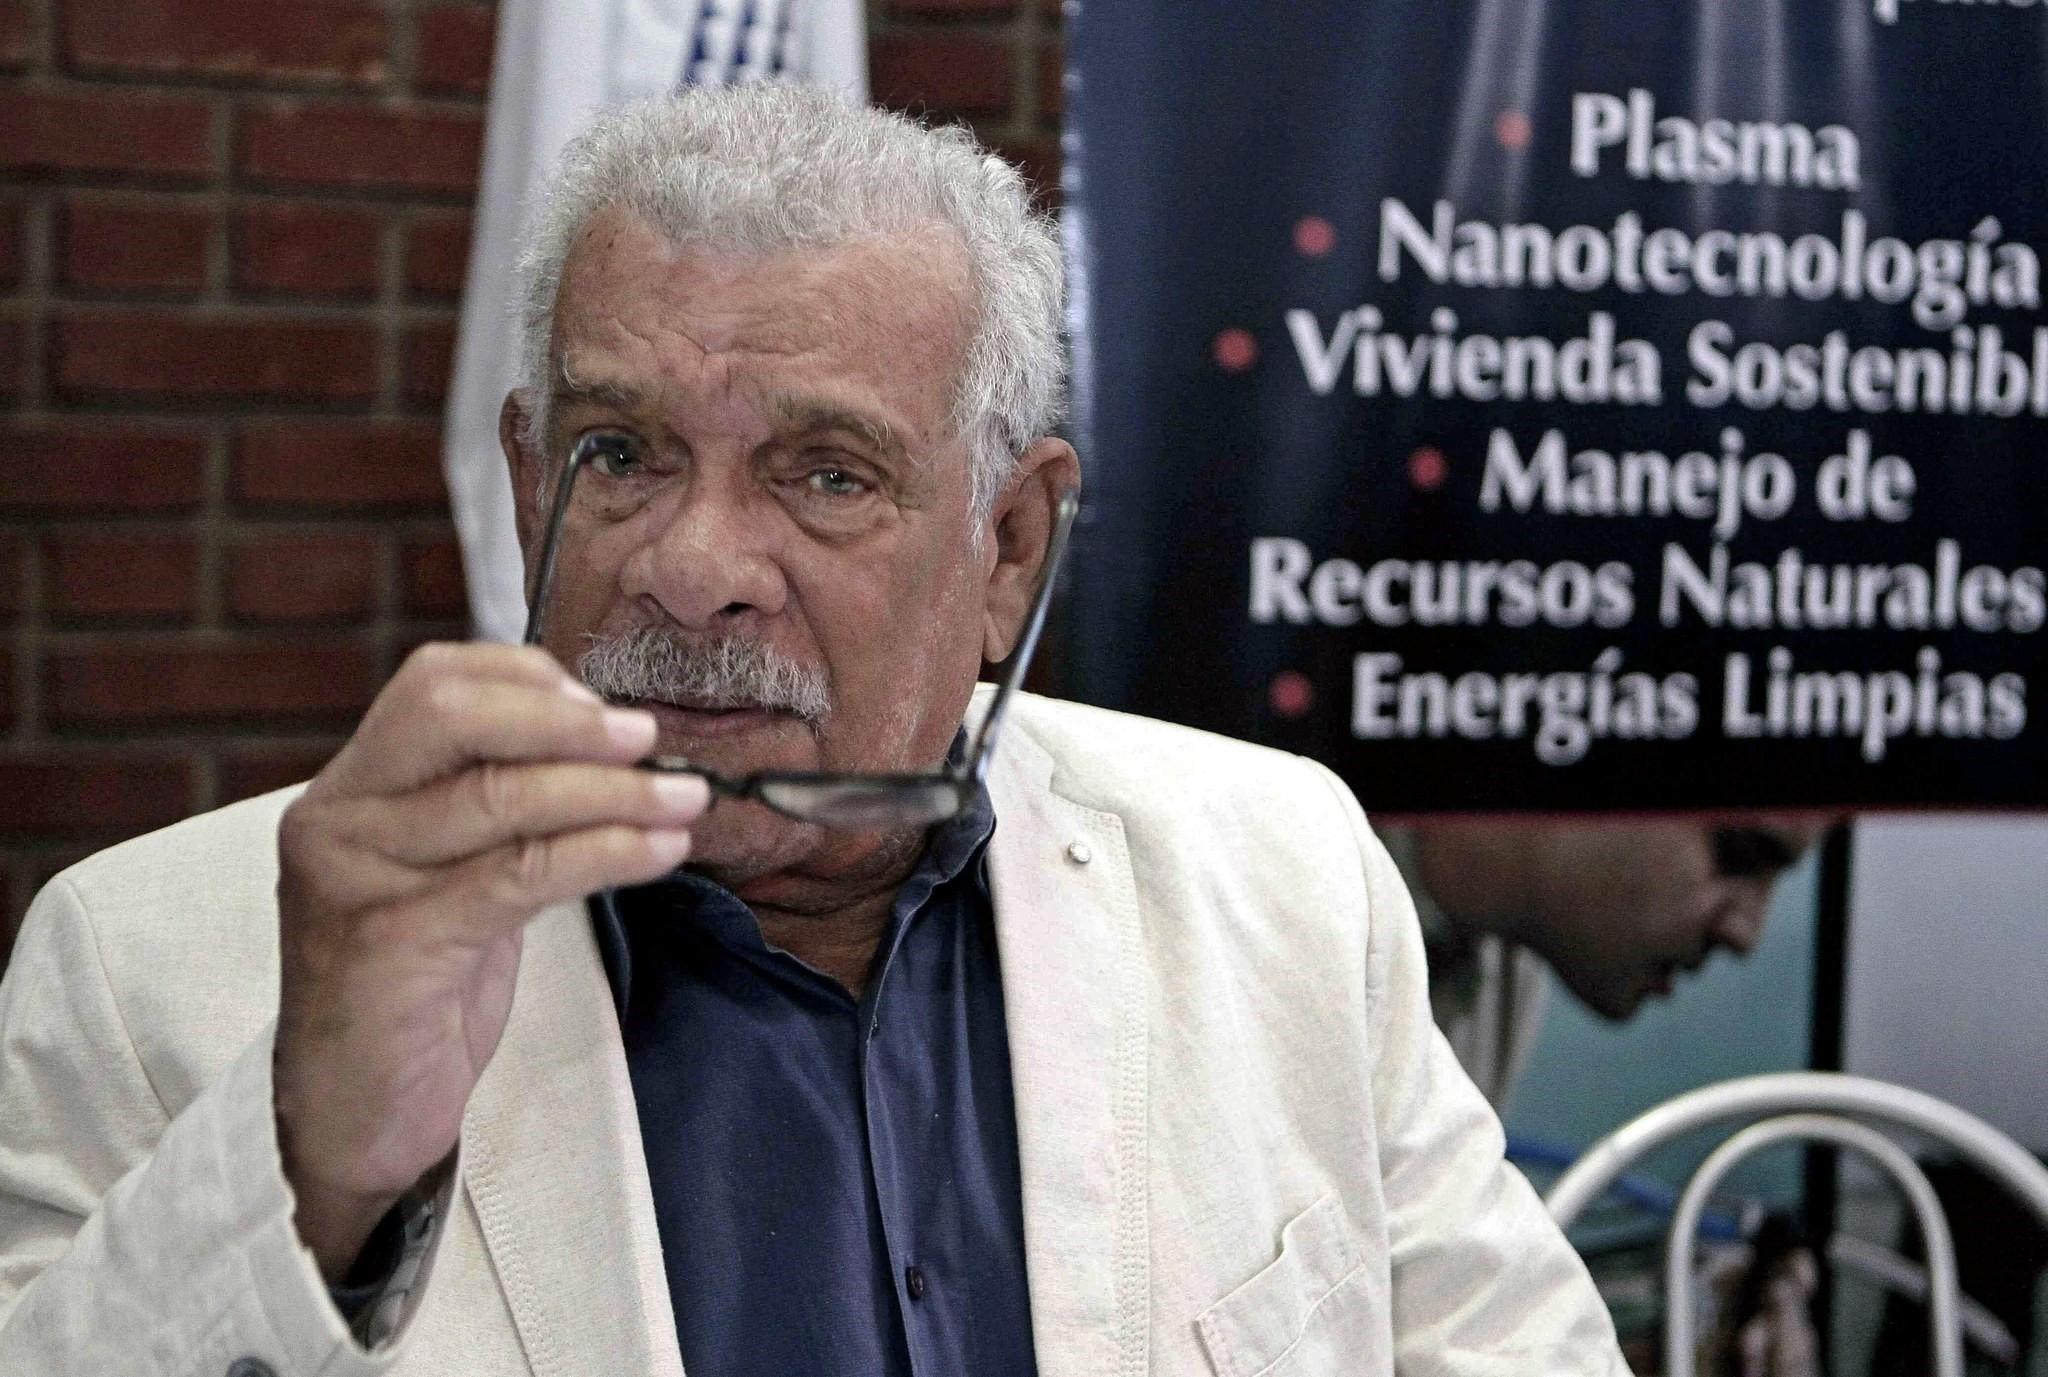 Nobel Prize in Literature laureate Derek Walcott gestures a press conference in San Jose, Costa Rica. (EPA Photo)